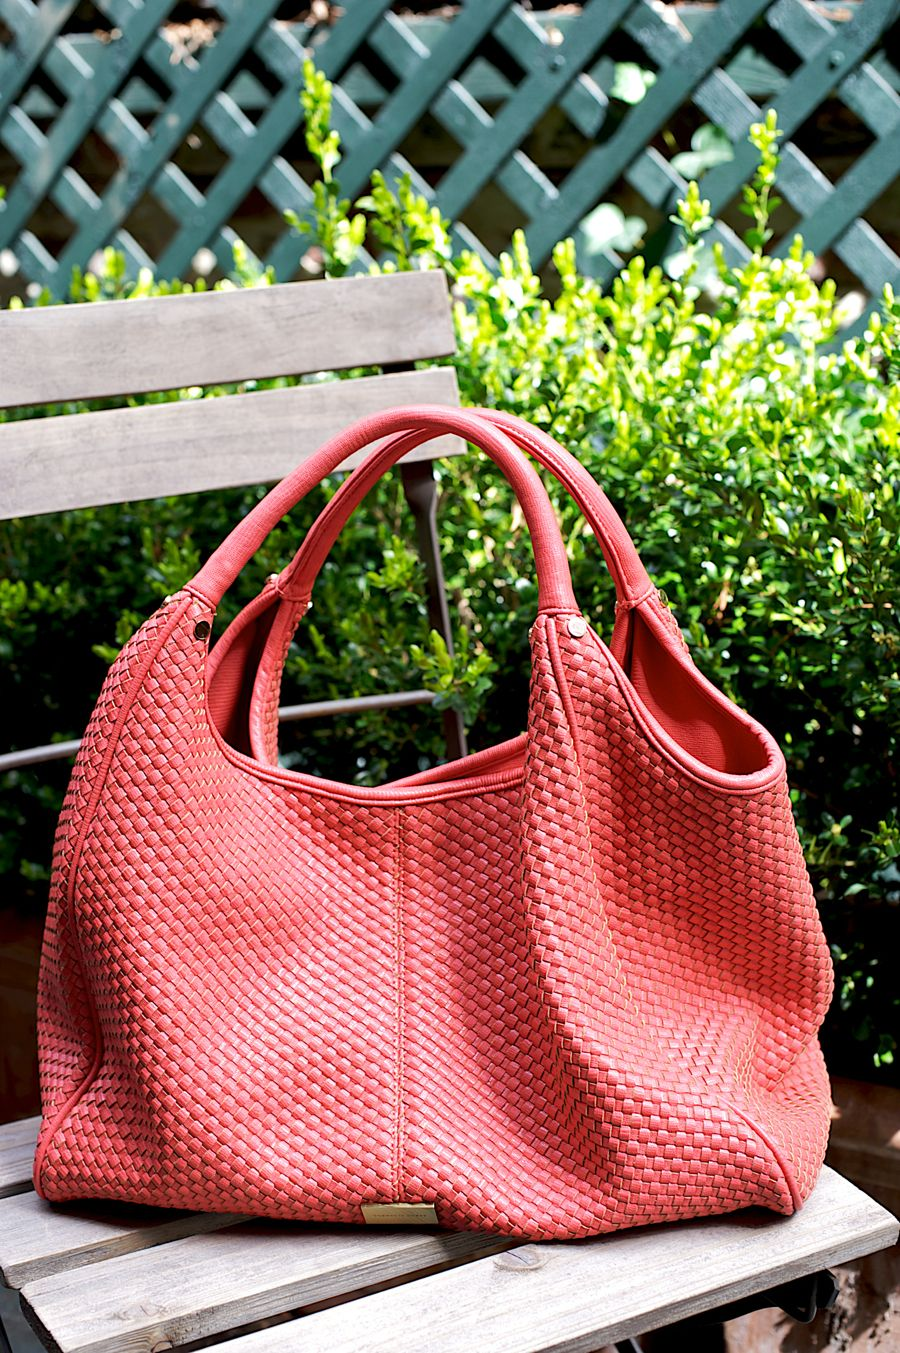 Handbag Cruelty By Free Cornelia A GuestBags Pinterest OXZPkiu